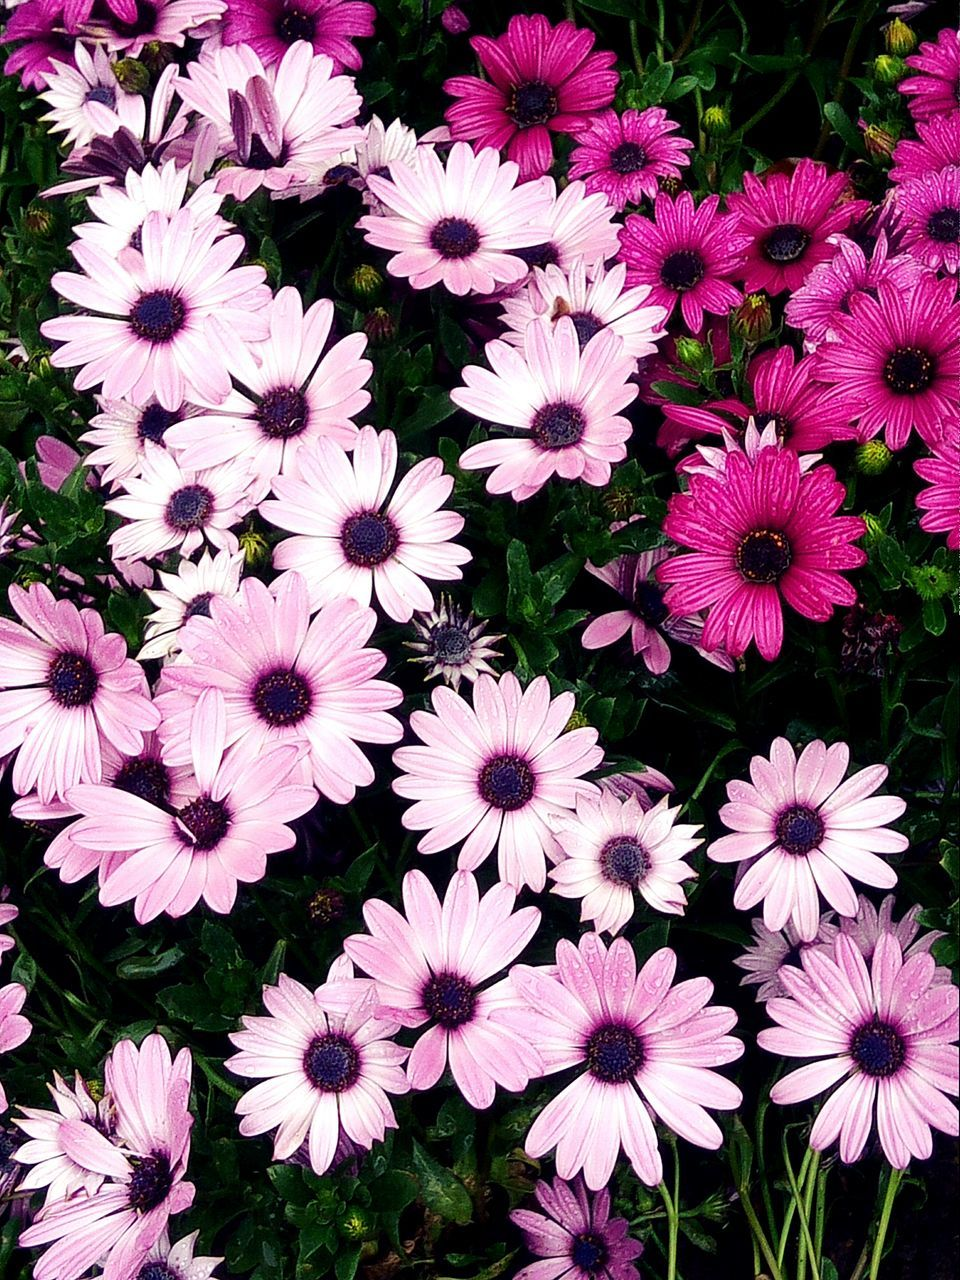 Flowers Blooming Outdoors